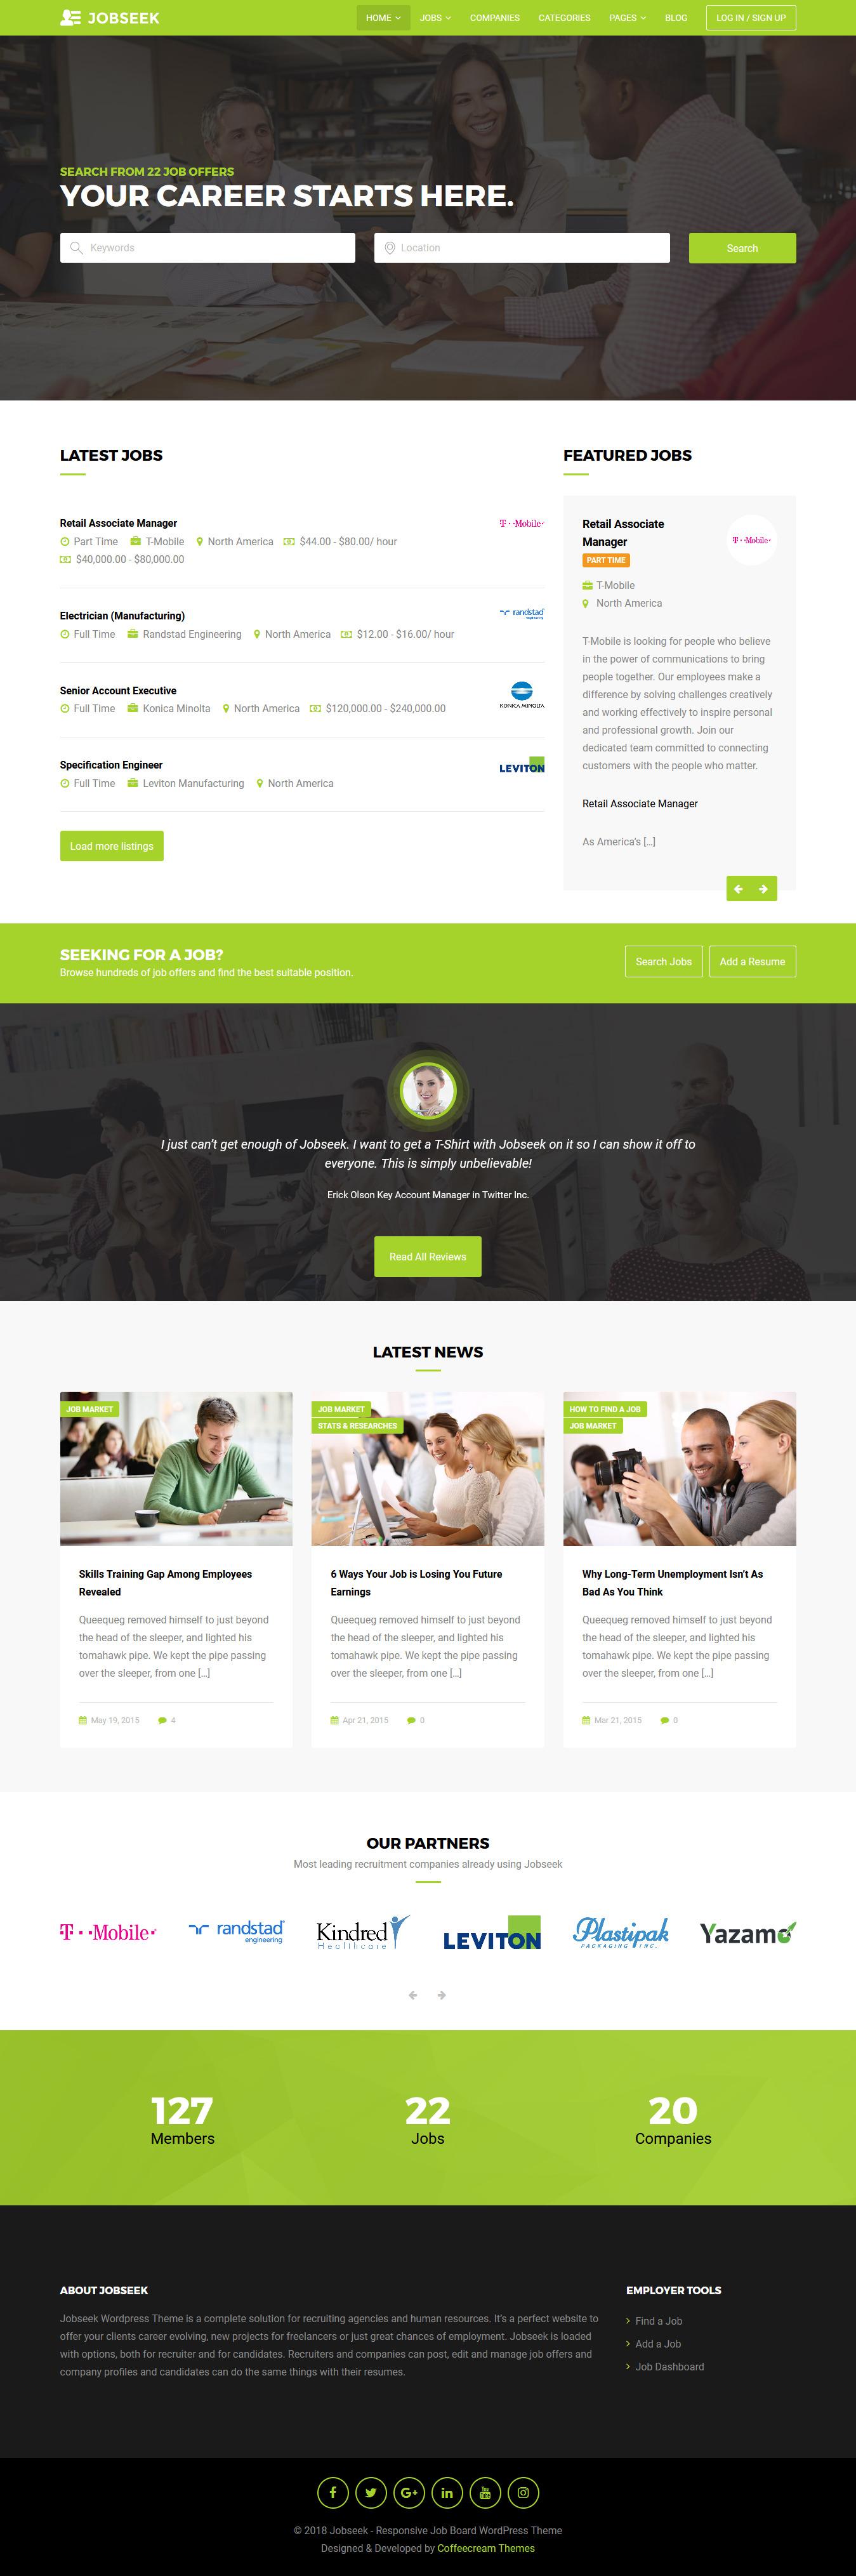 jobseek best premium job board wordpress theme - 10+ Best Premium Job Board WordPress Themes